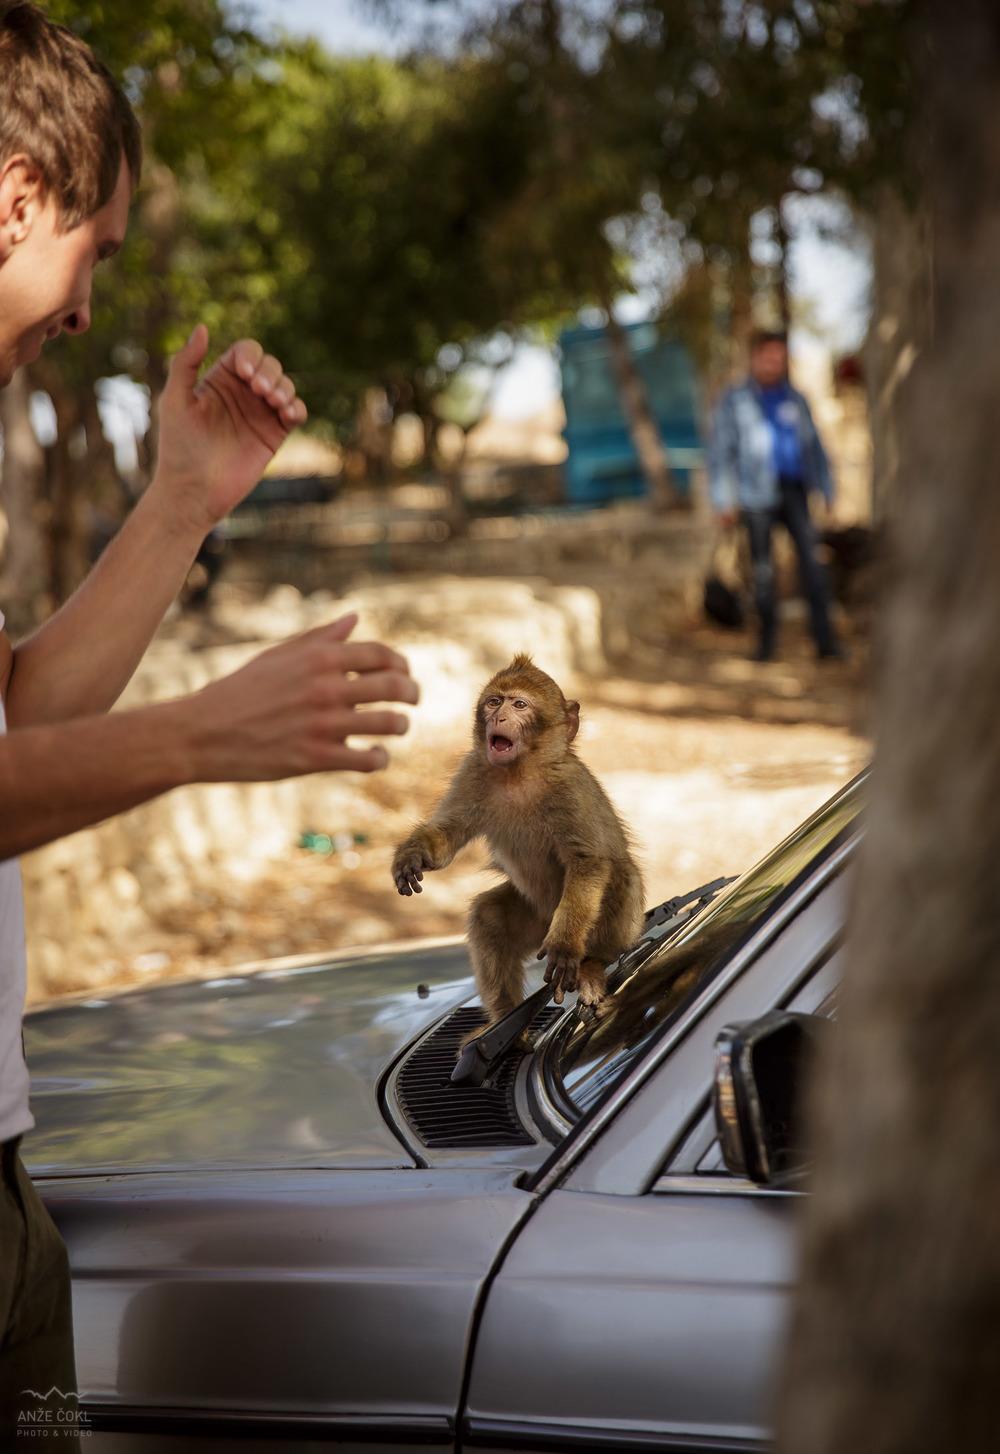 Nadležna opica je bila presenetljivo bistra.